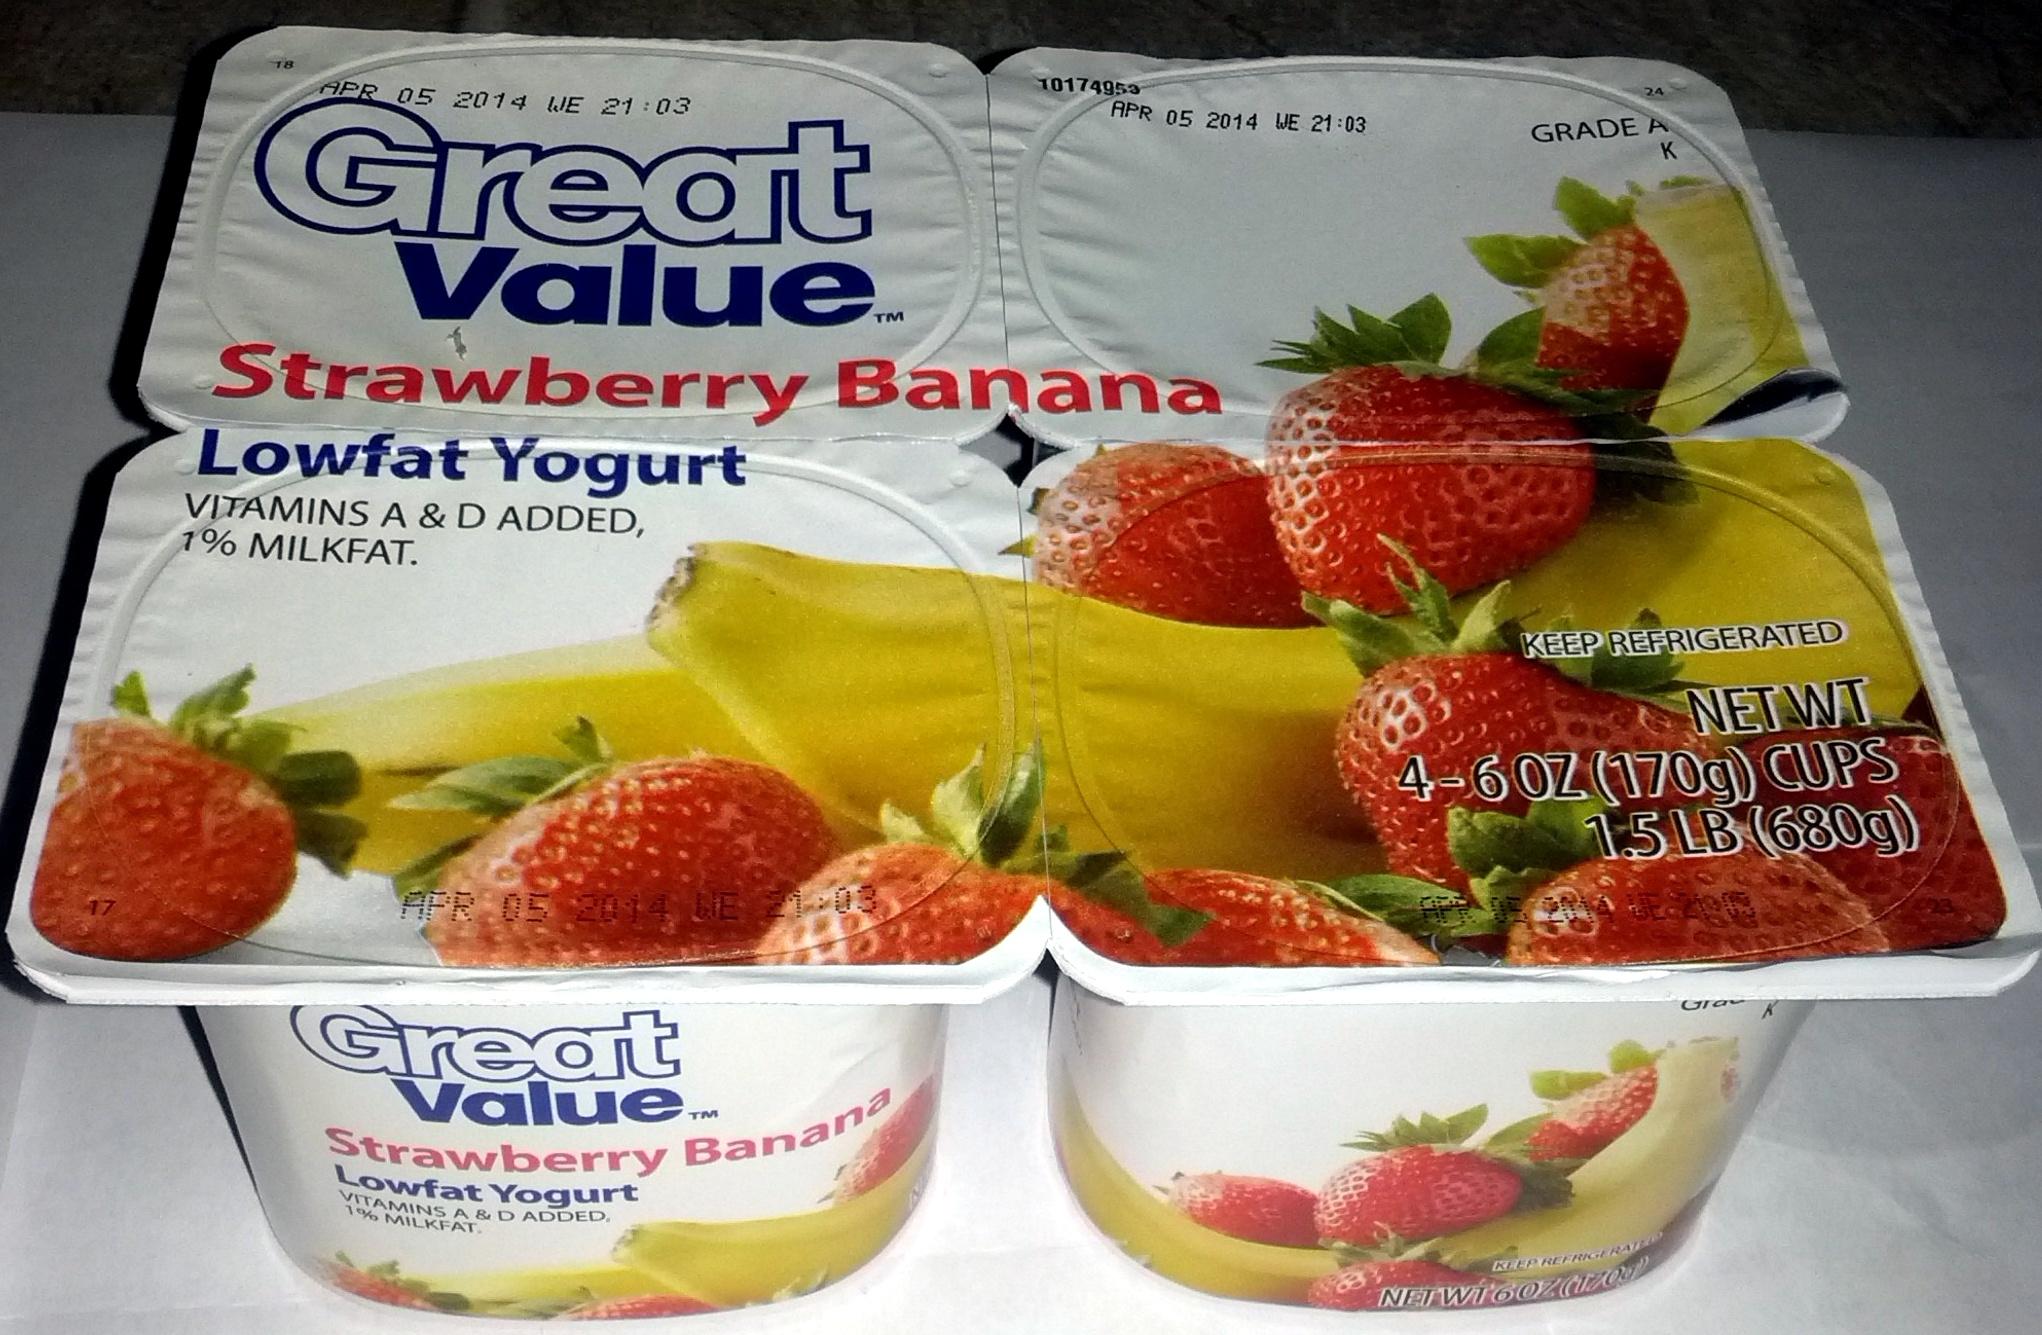 Strawberry Banana Lowfat Yogurt - Great Value